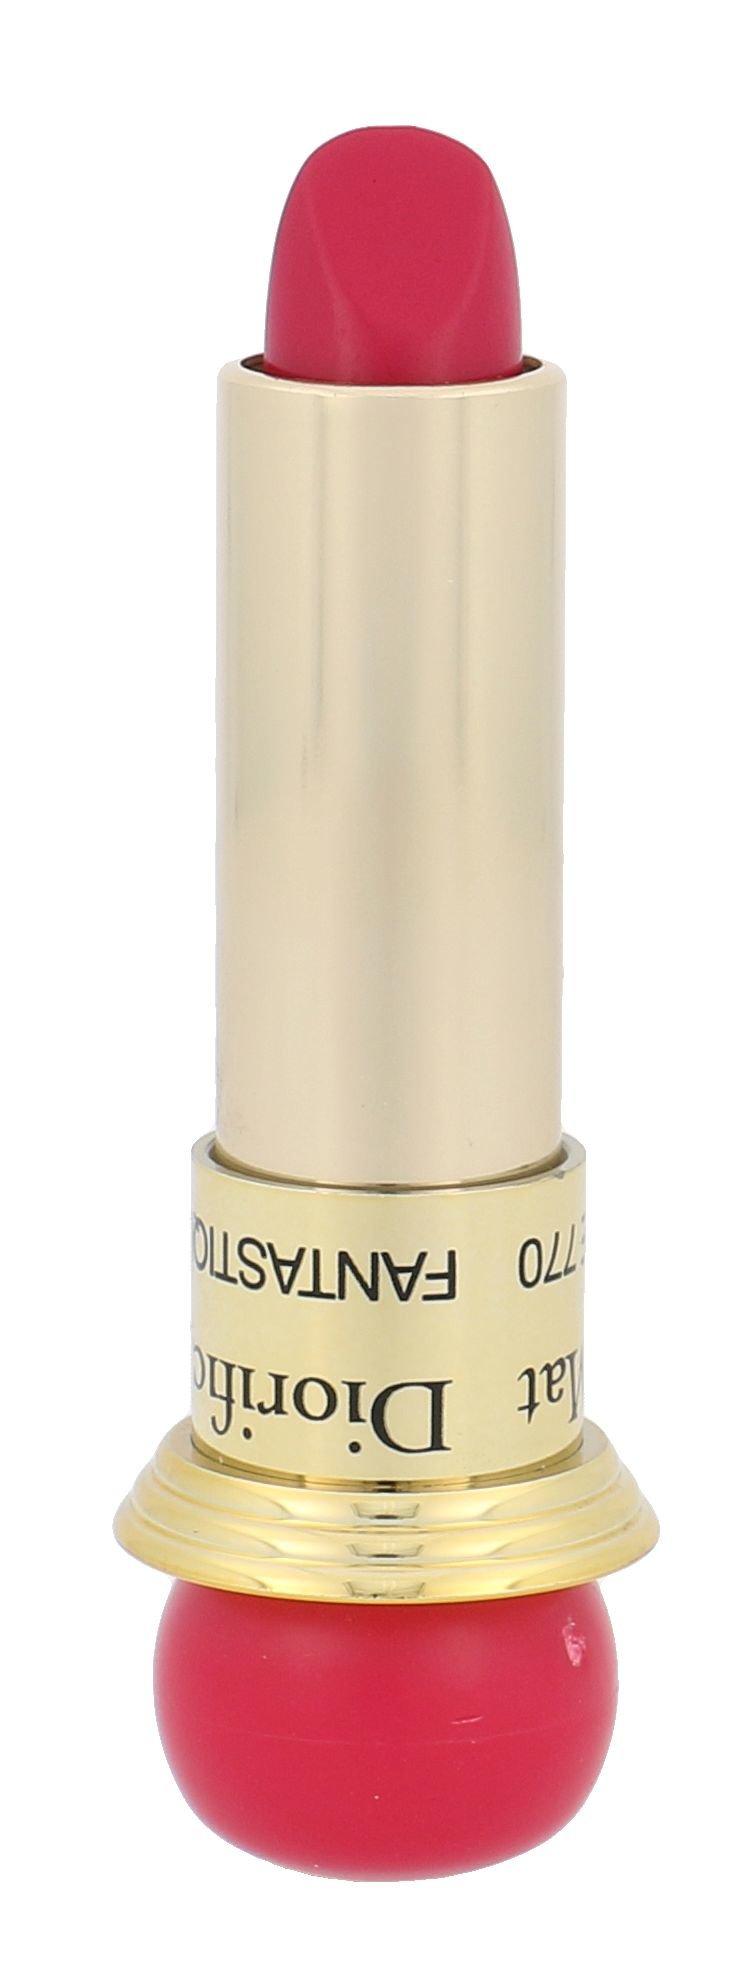 Christian Dior Diorific Cosmetic 3,5ml 770 Fantastique Mat